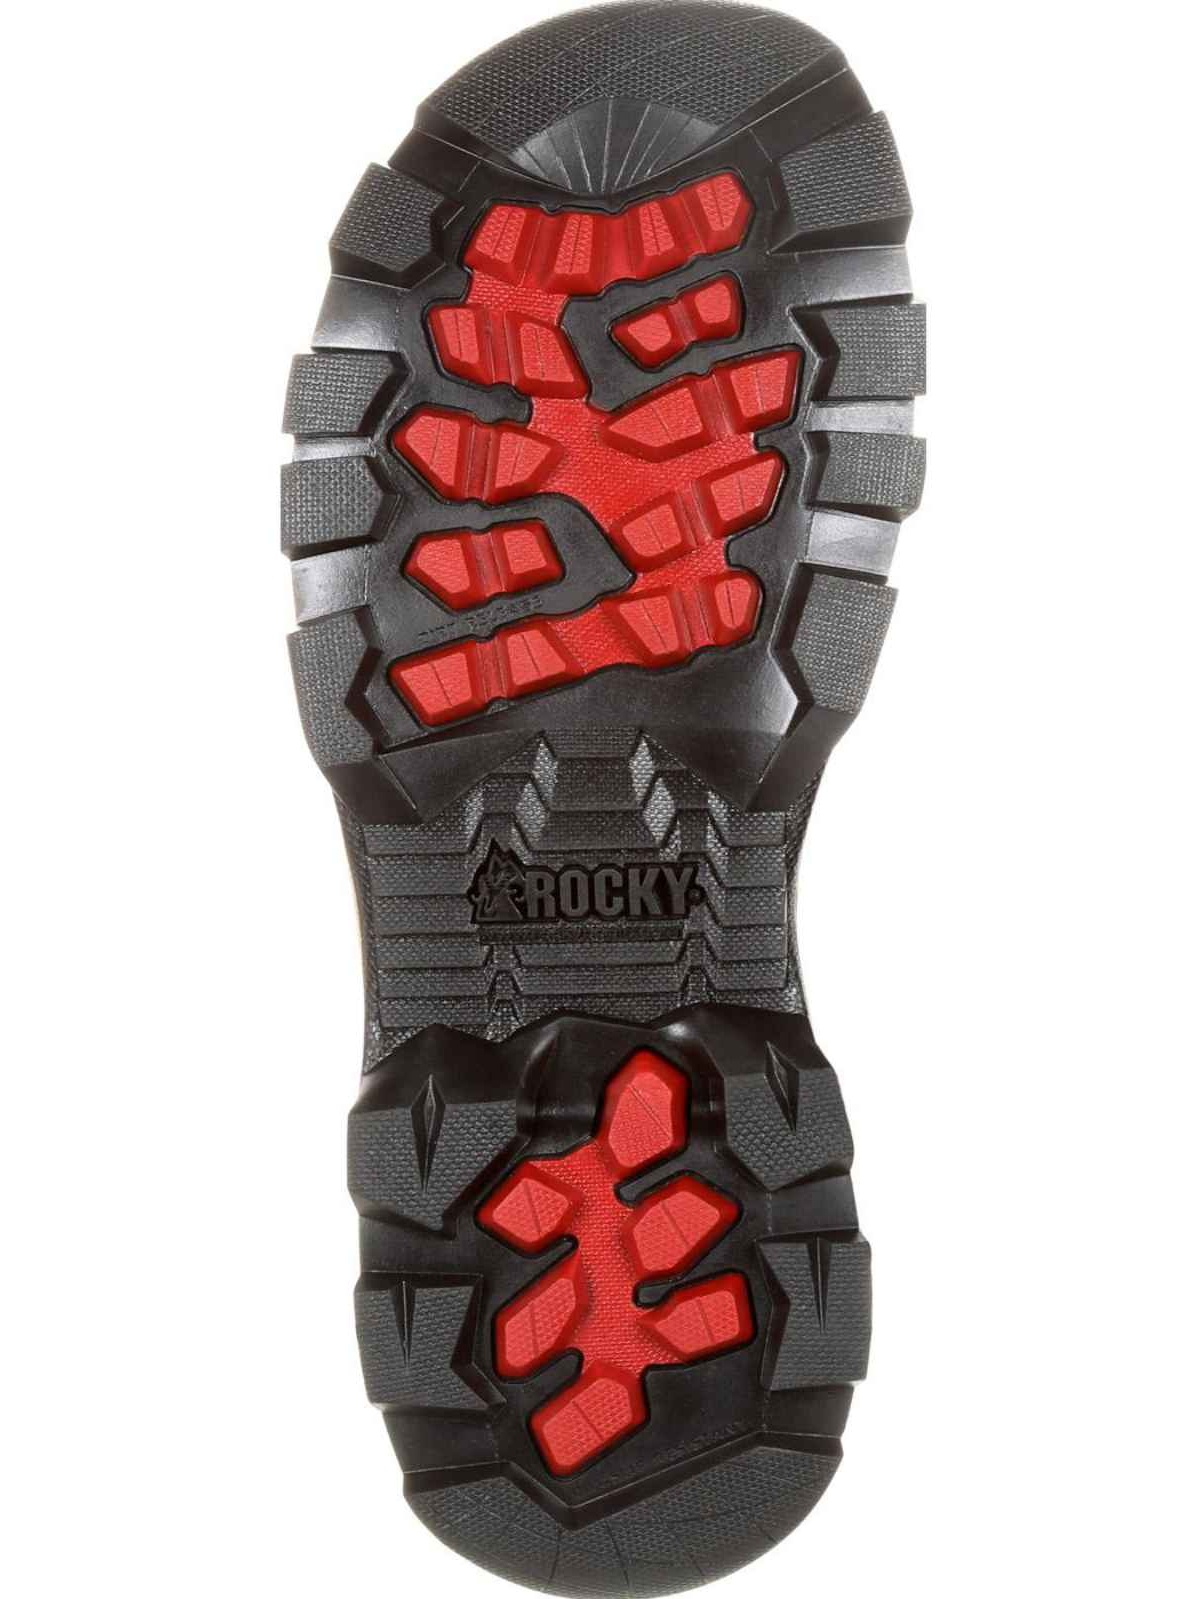 Rocky Men's Endeavor Point Composite Toe Waterproof Work Hiker Boot Brn RKK0234